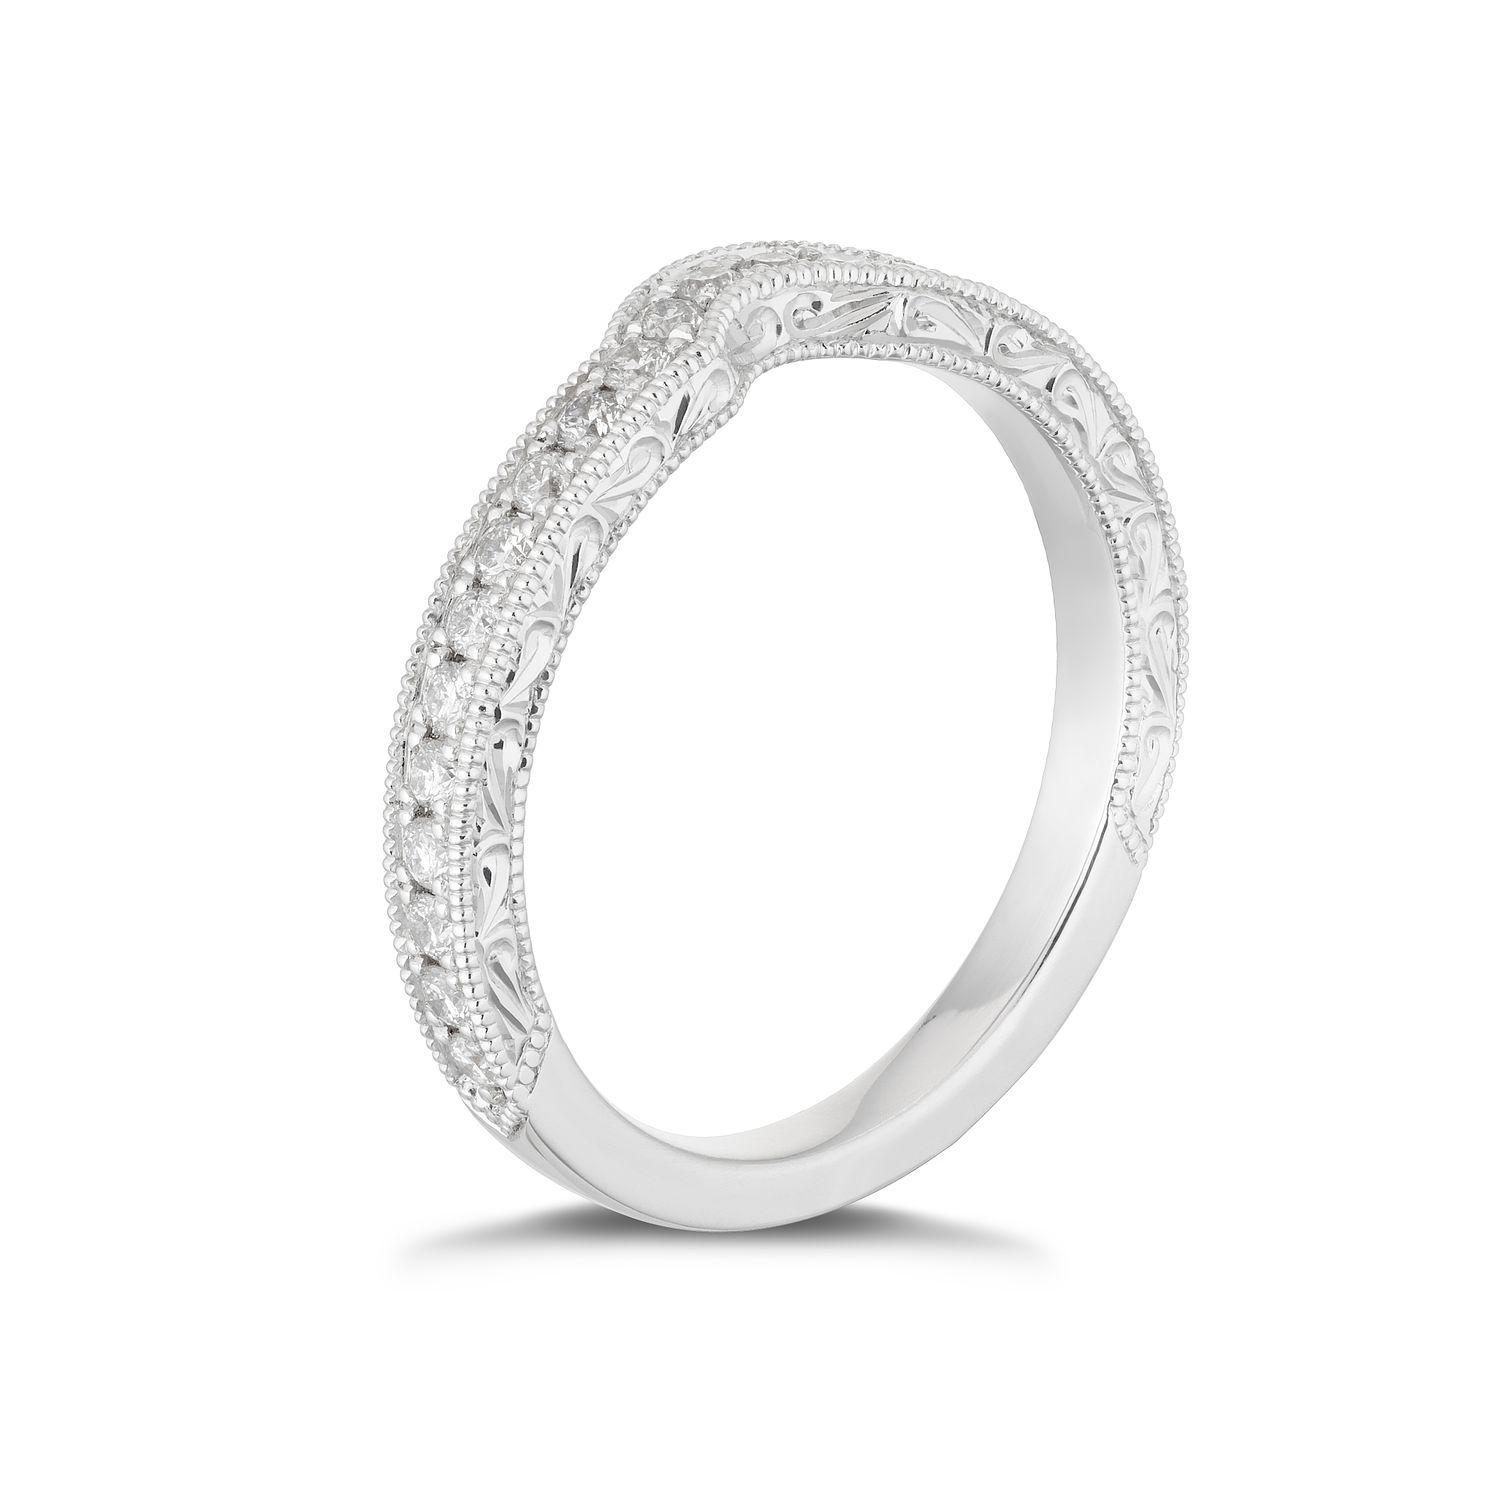 Neil Lane Platinum 0.33ct Diamond Shaped Ring Ernest